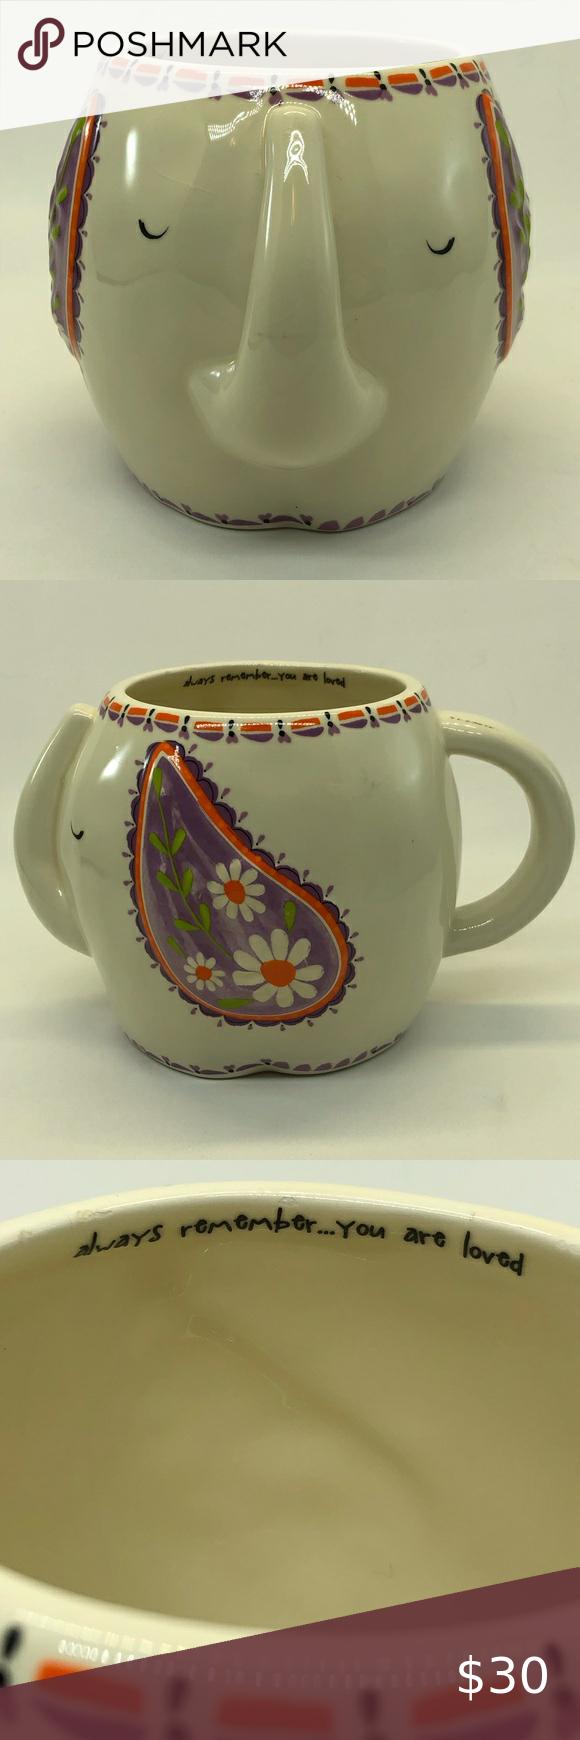 Natural Life Elephant Folk Art Ceramic Mug 16 Oz In 2020 Ceramic Mug Mugs Natural Life